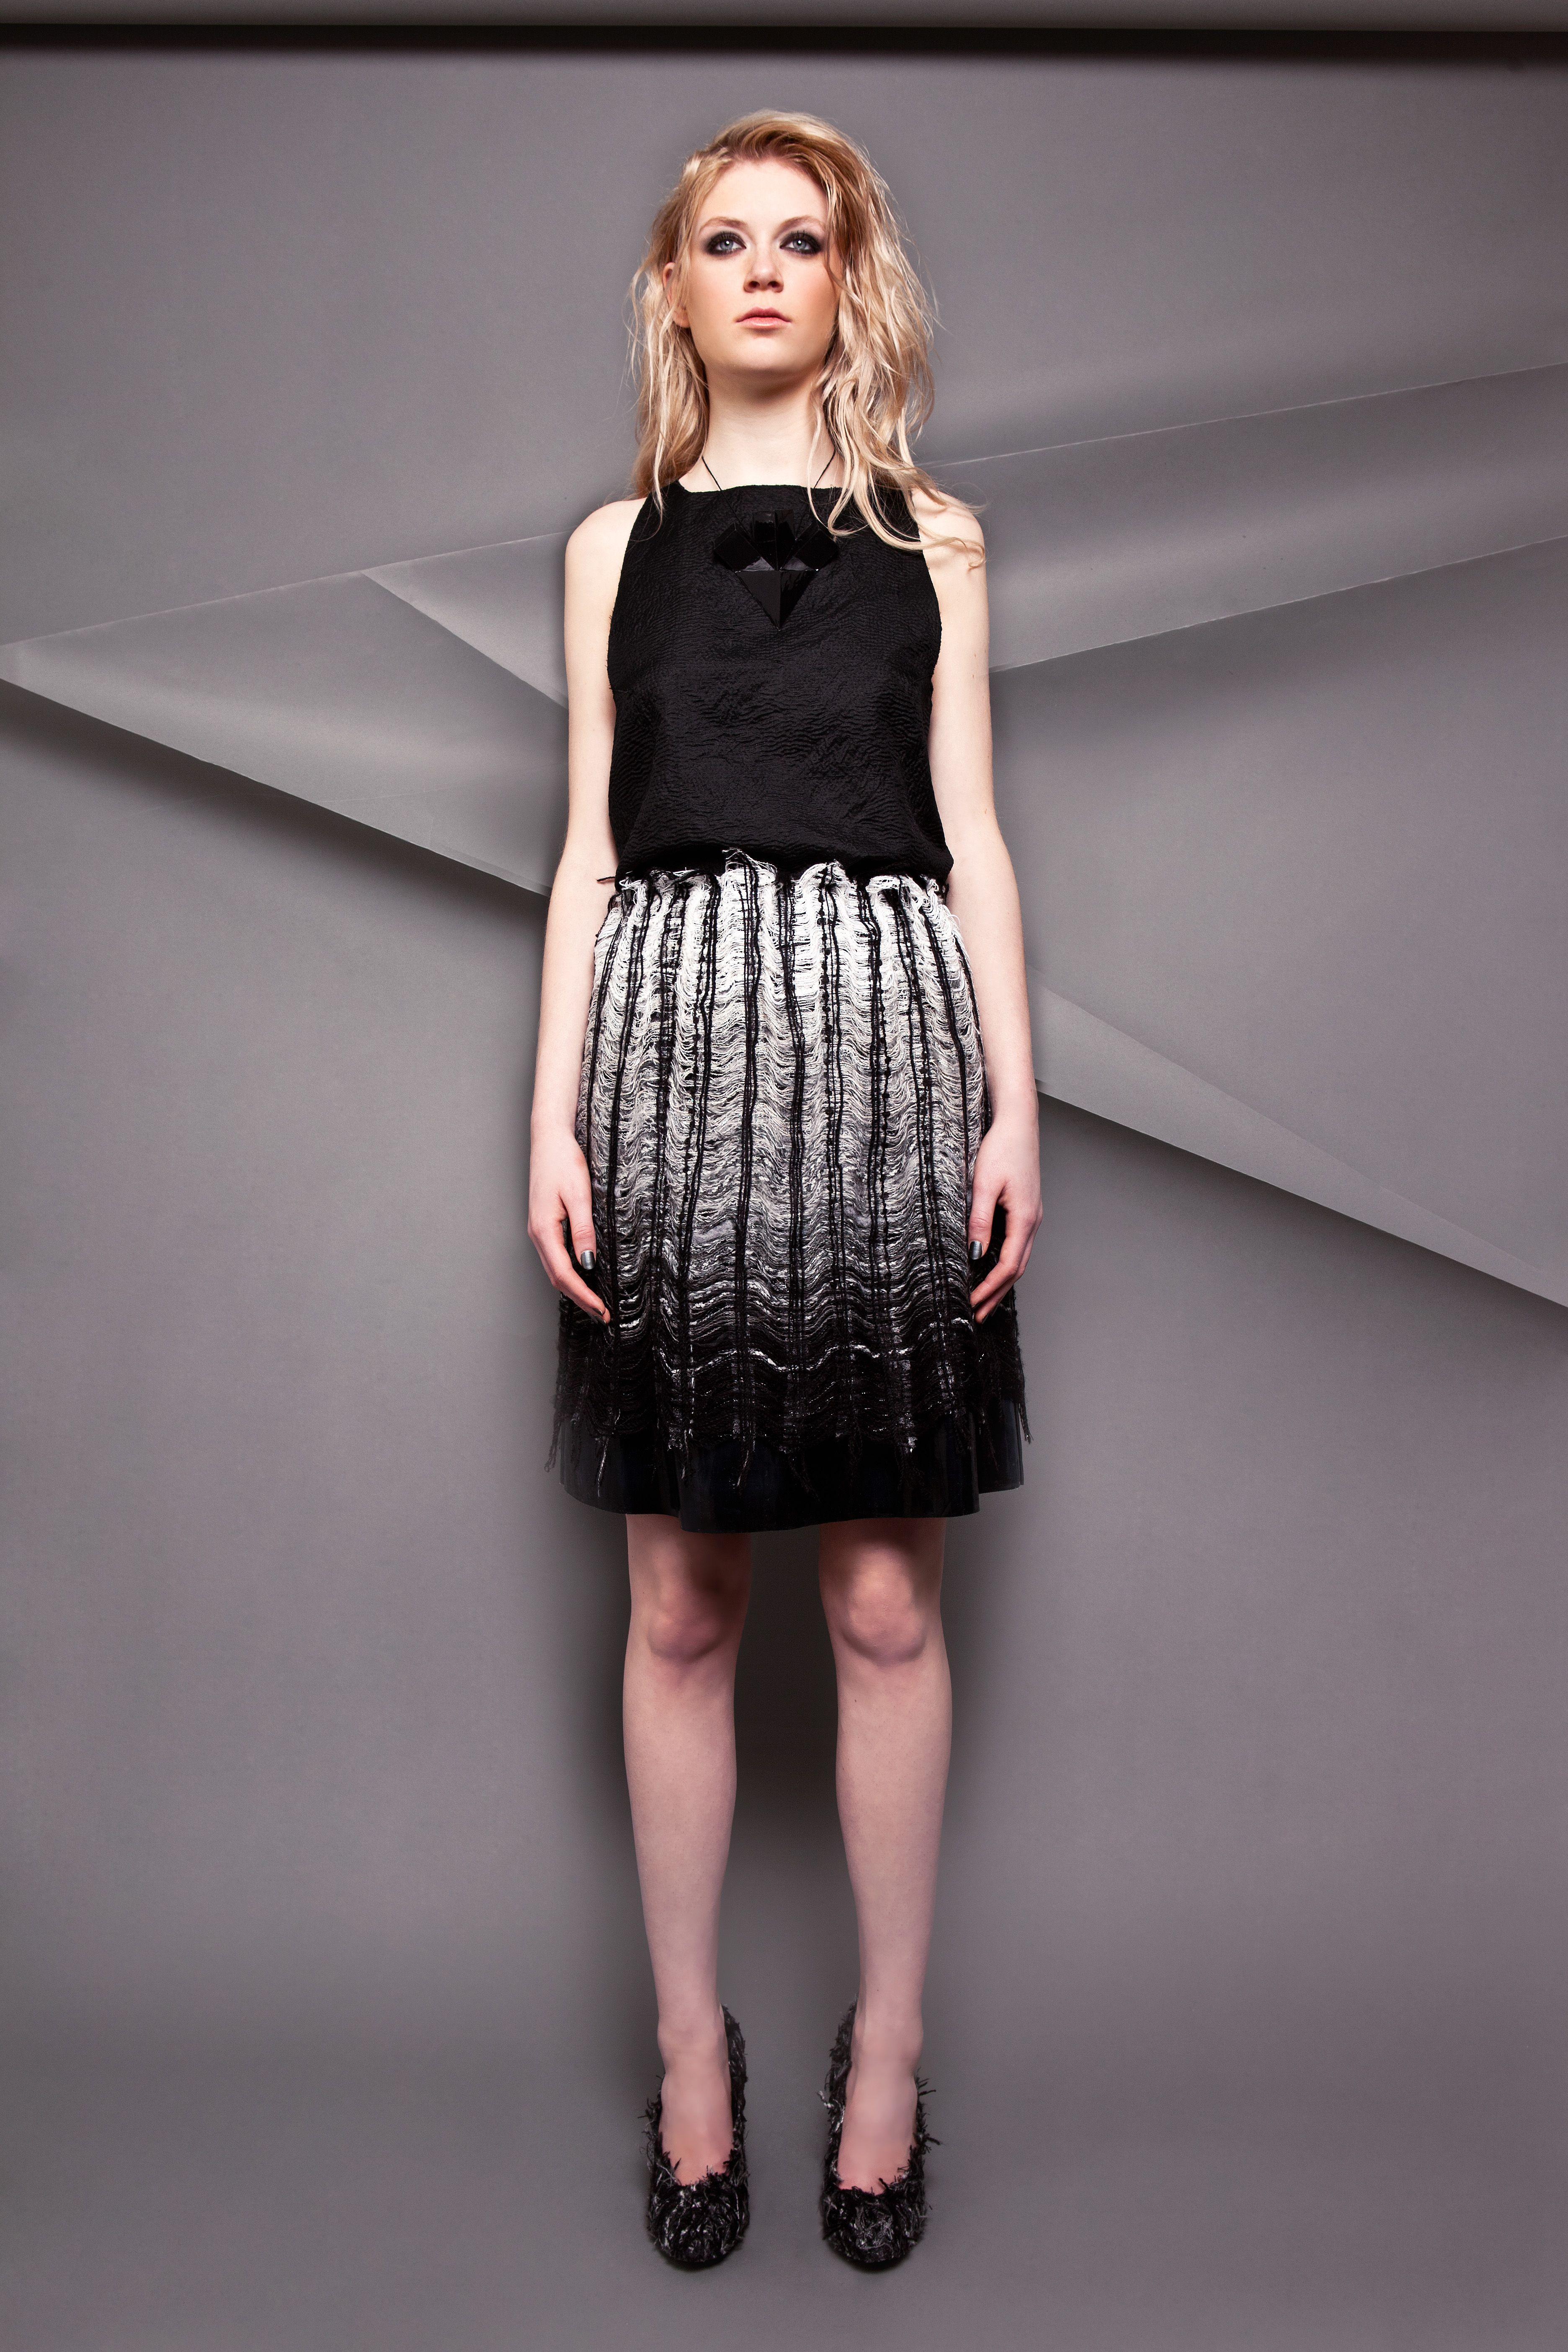 Hellen van Rees AW14 look 2 #AW14 #hellenvanrees #fashion